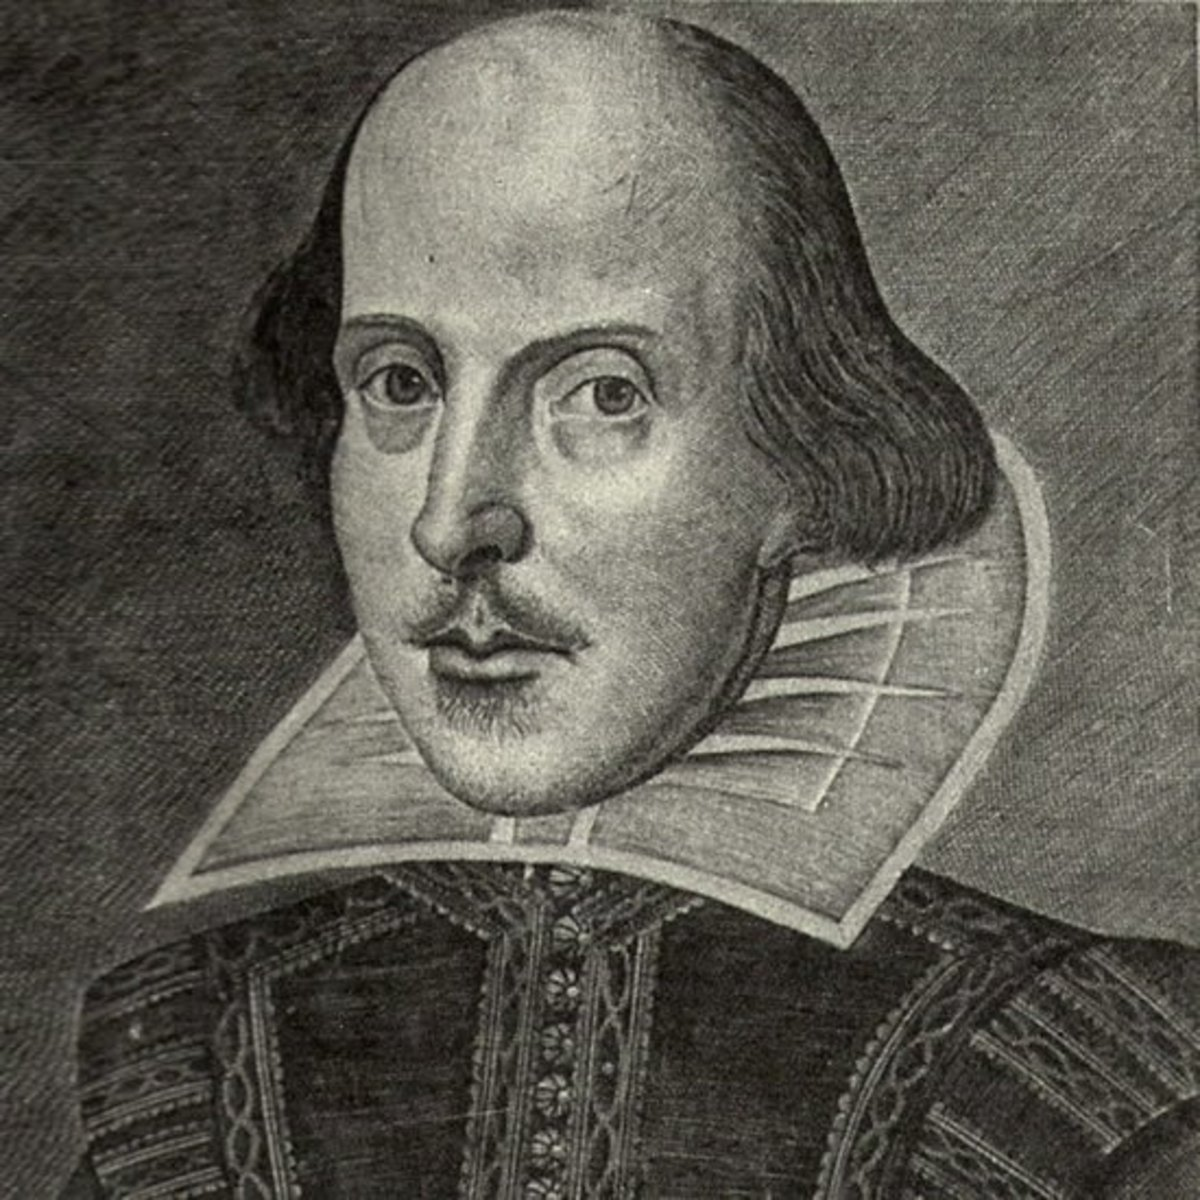 Will Shakespeare: Actor, Playwright, and Vampire